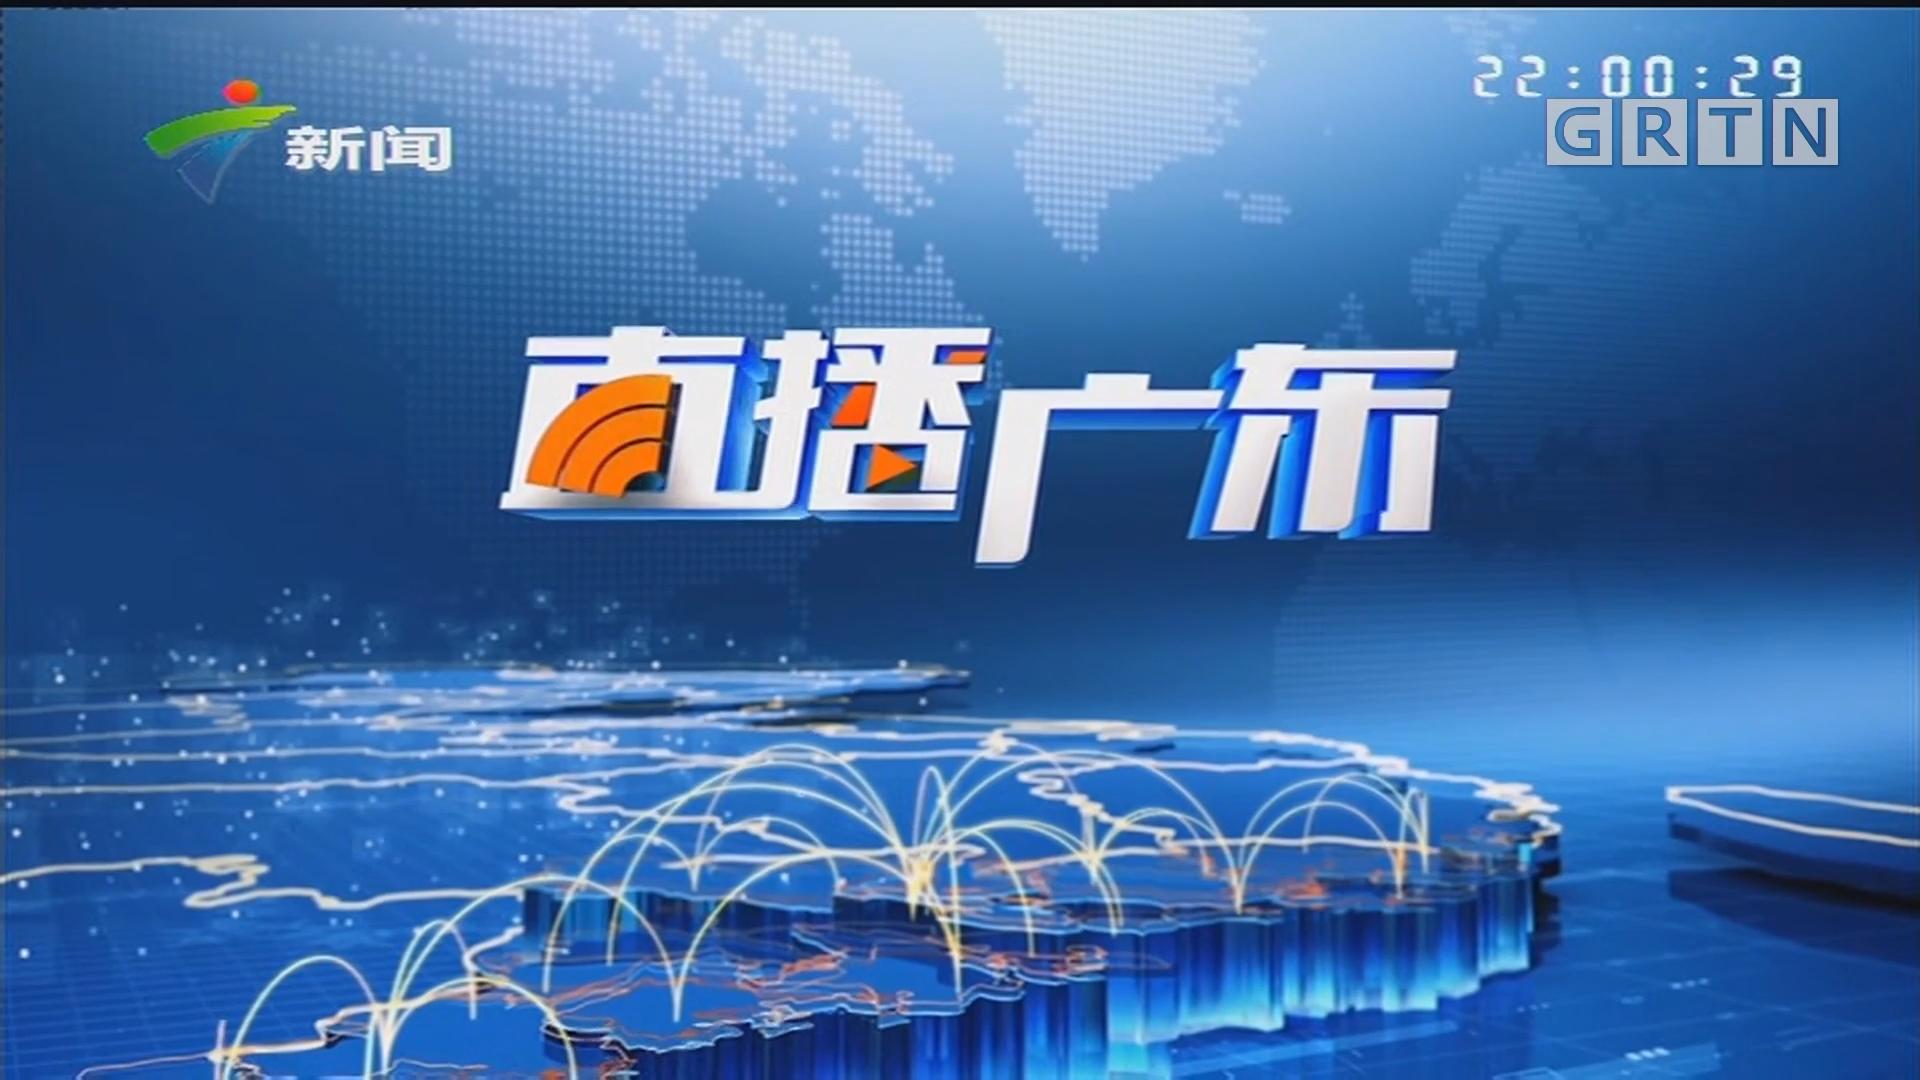 [HD][2019-09-12]直播广东:广东:今年1至8月刑事警情同比下降11.9%